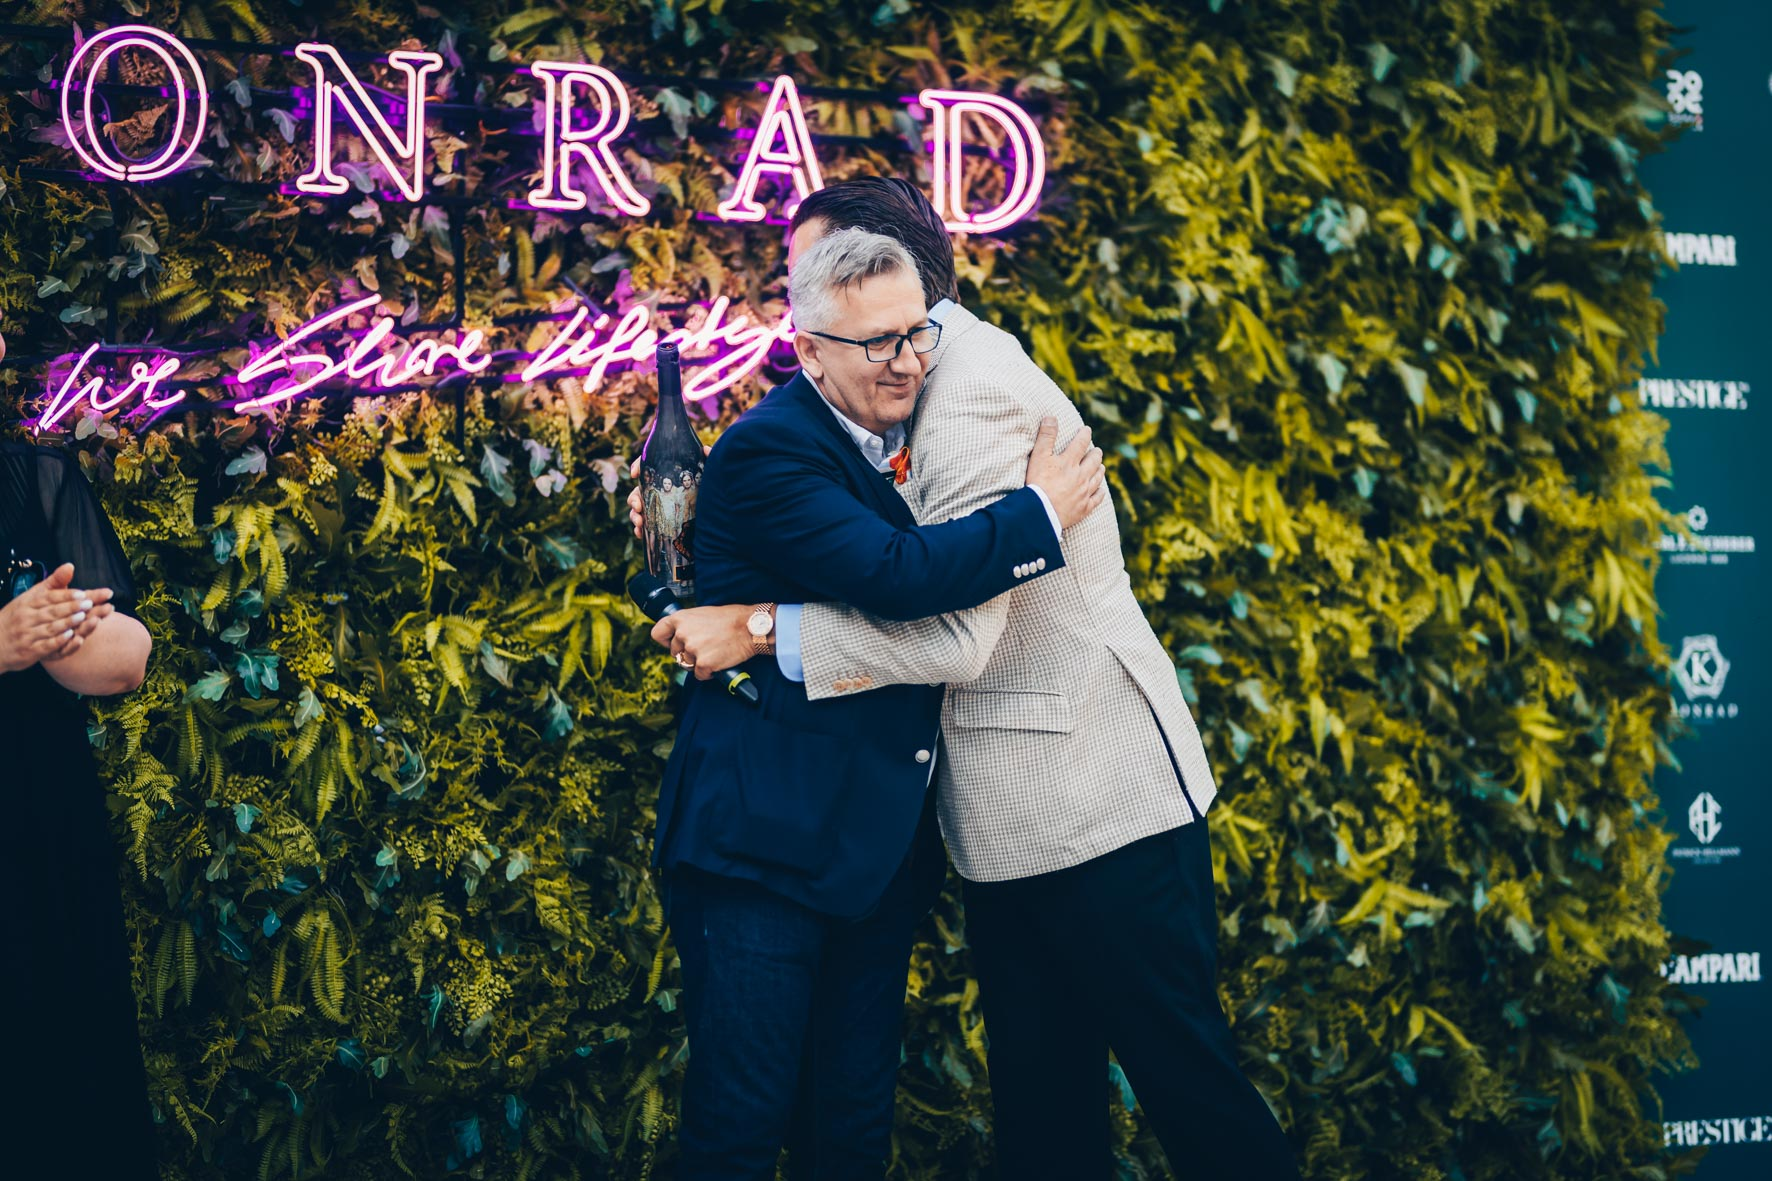 Konrad-lifestyle-art-basel-%22stmoritz%22-2019-23.jpg